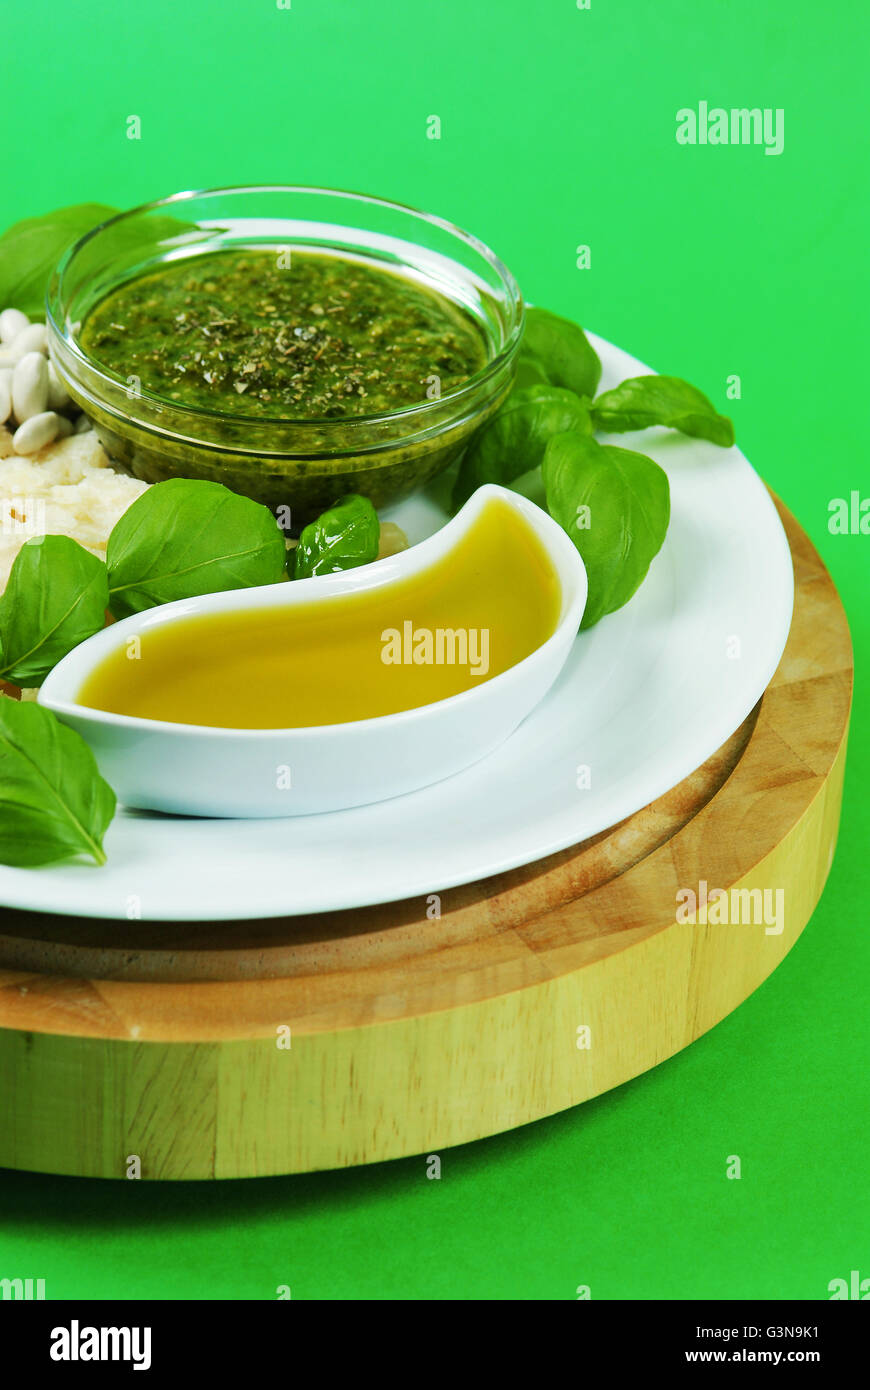 L'Europe, Italie, Ligurie, Gênes, la gastronomie typique de la Ligurie italienne Pesto Photo Stock